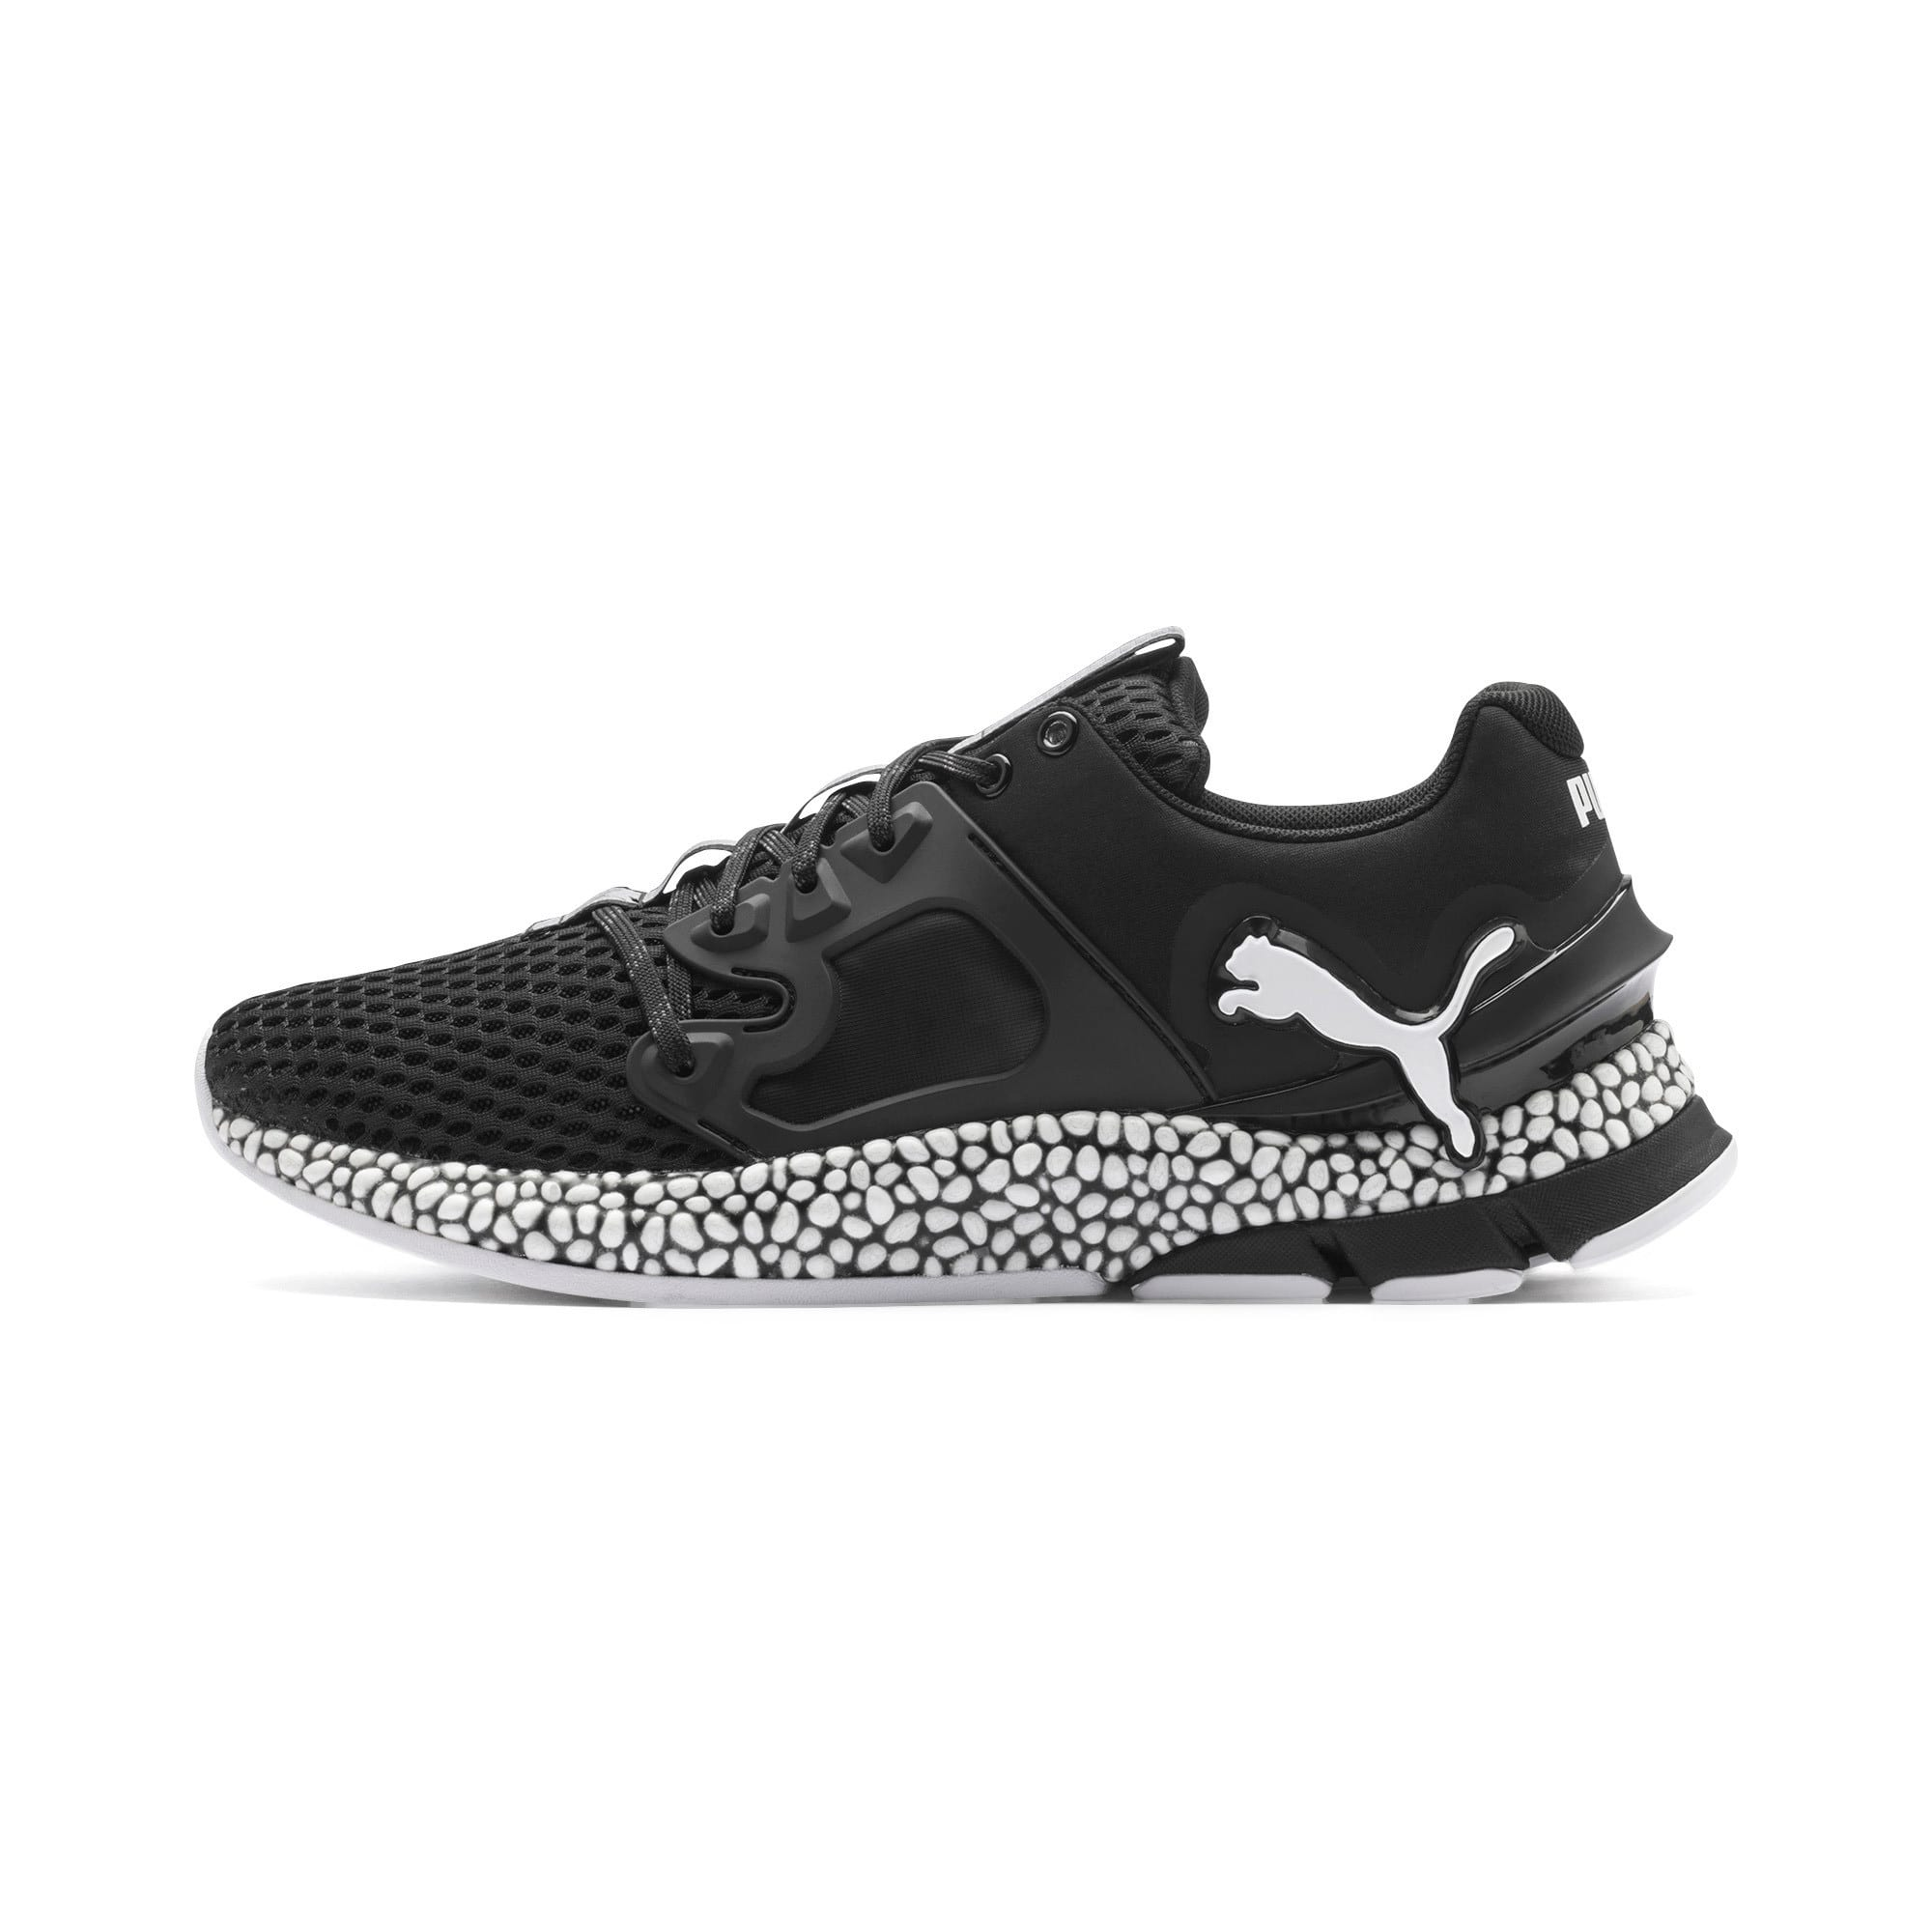 Thumbnail 1 of HYBRID Sky Men's Running Shoes, Puma Black-Puma White, medium